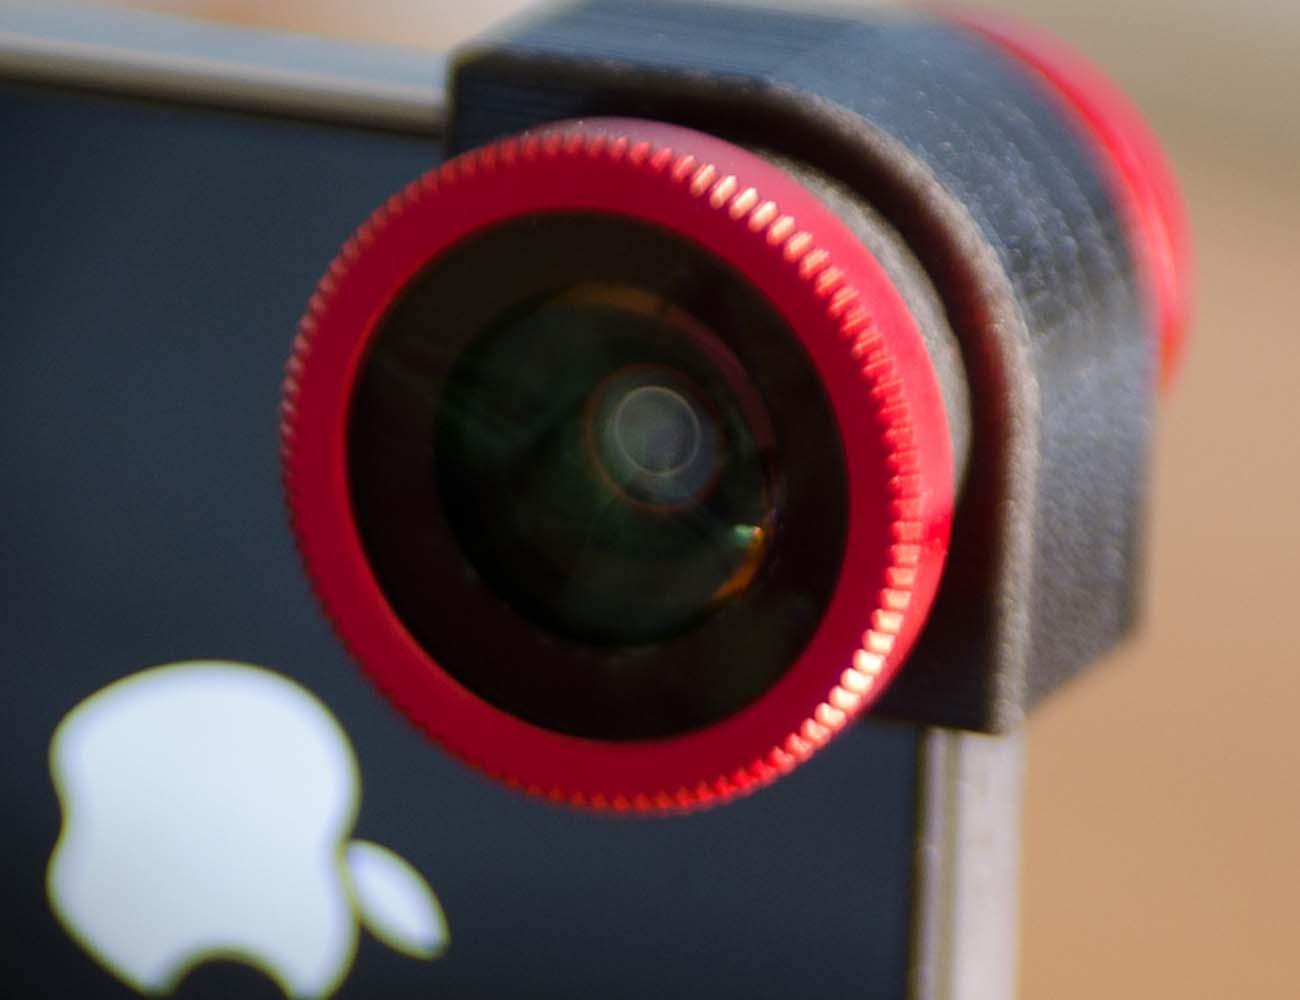 Olloclip 4-in-1 Lens for iPad Air/Mini